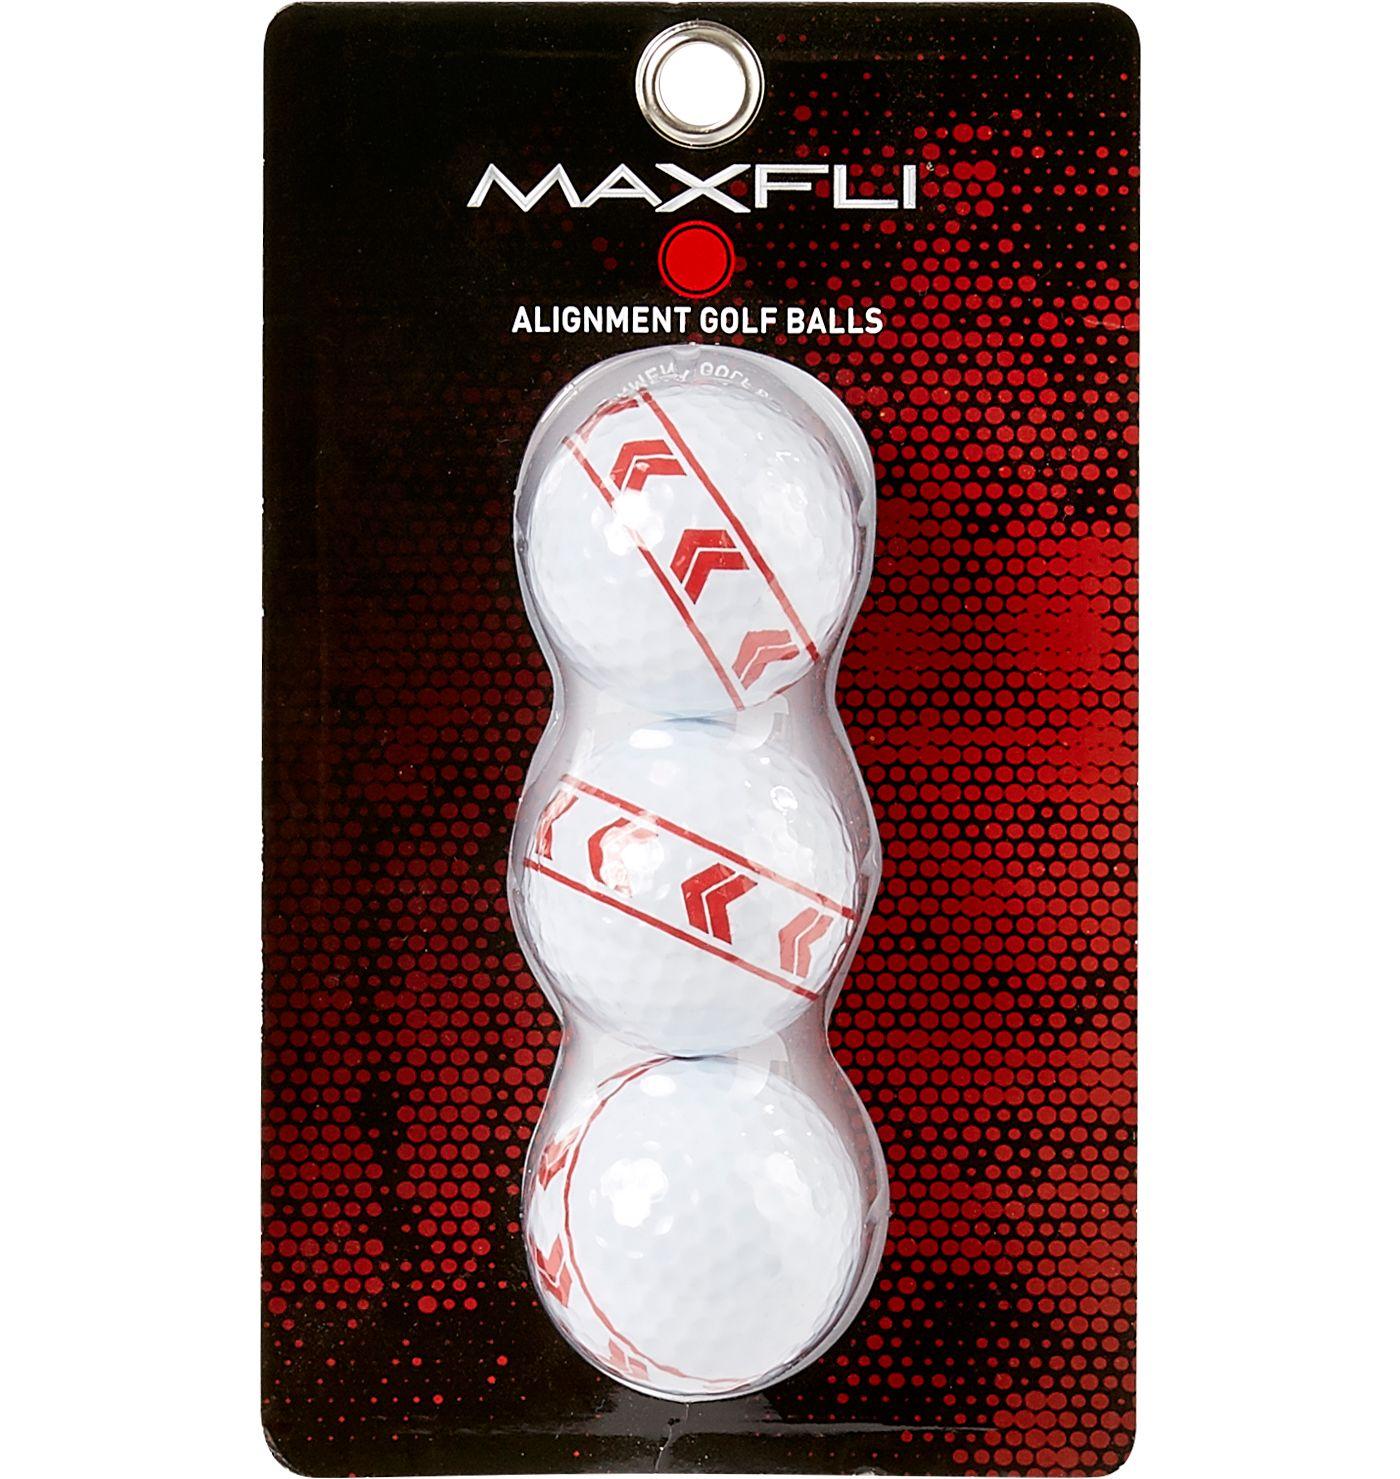 Maxfli Alignment Golf Balls